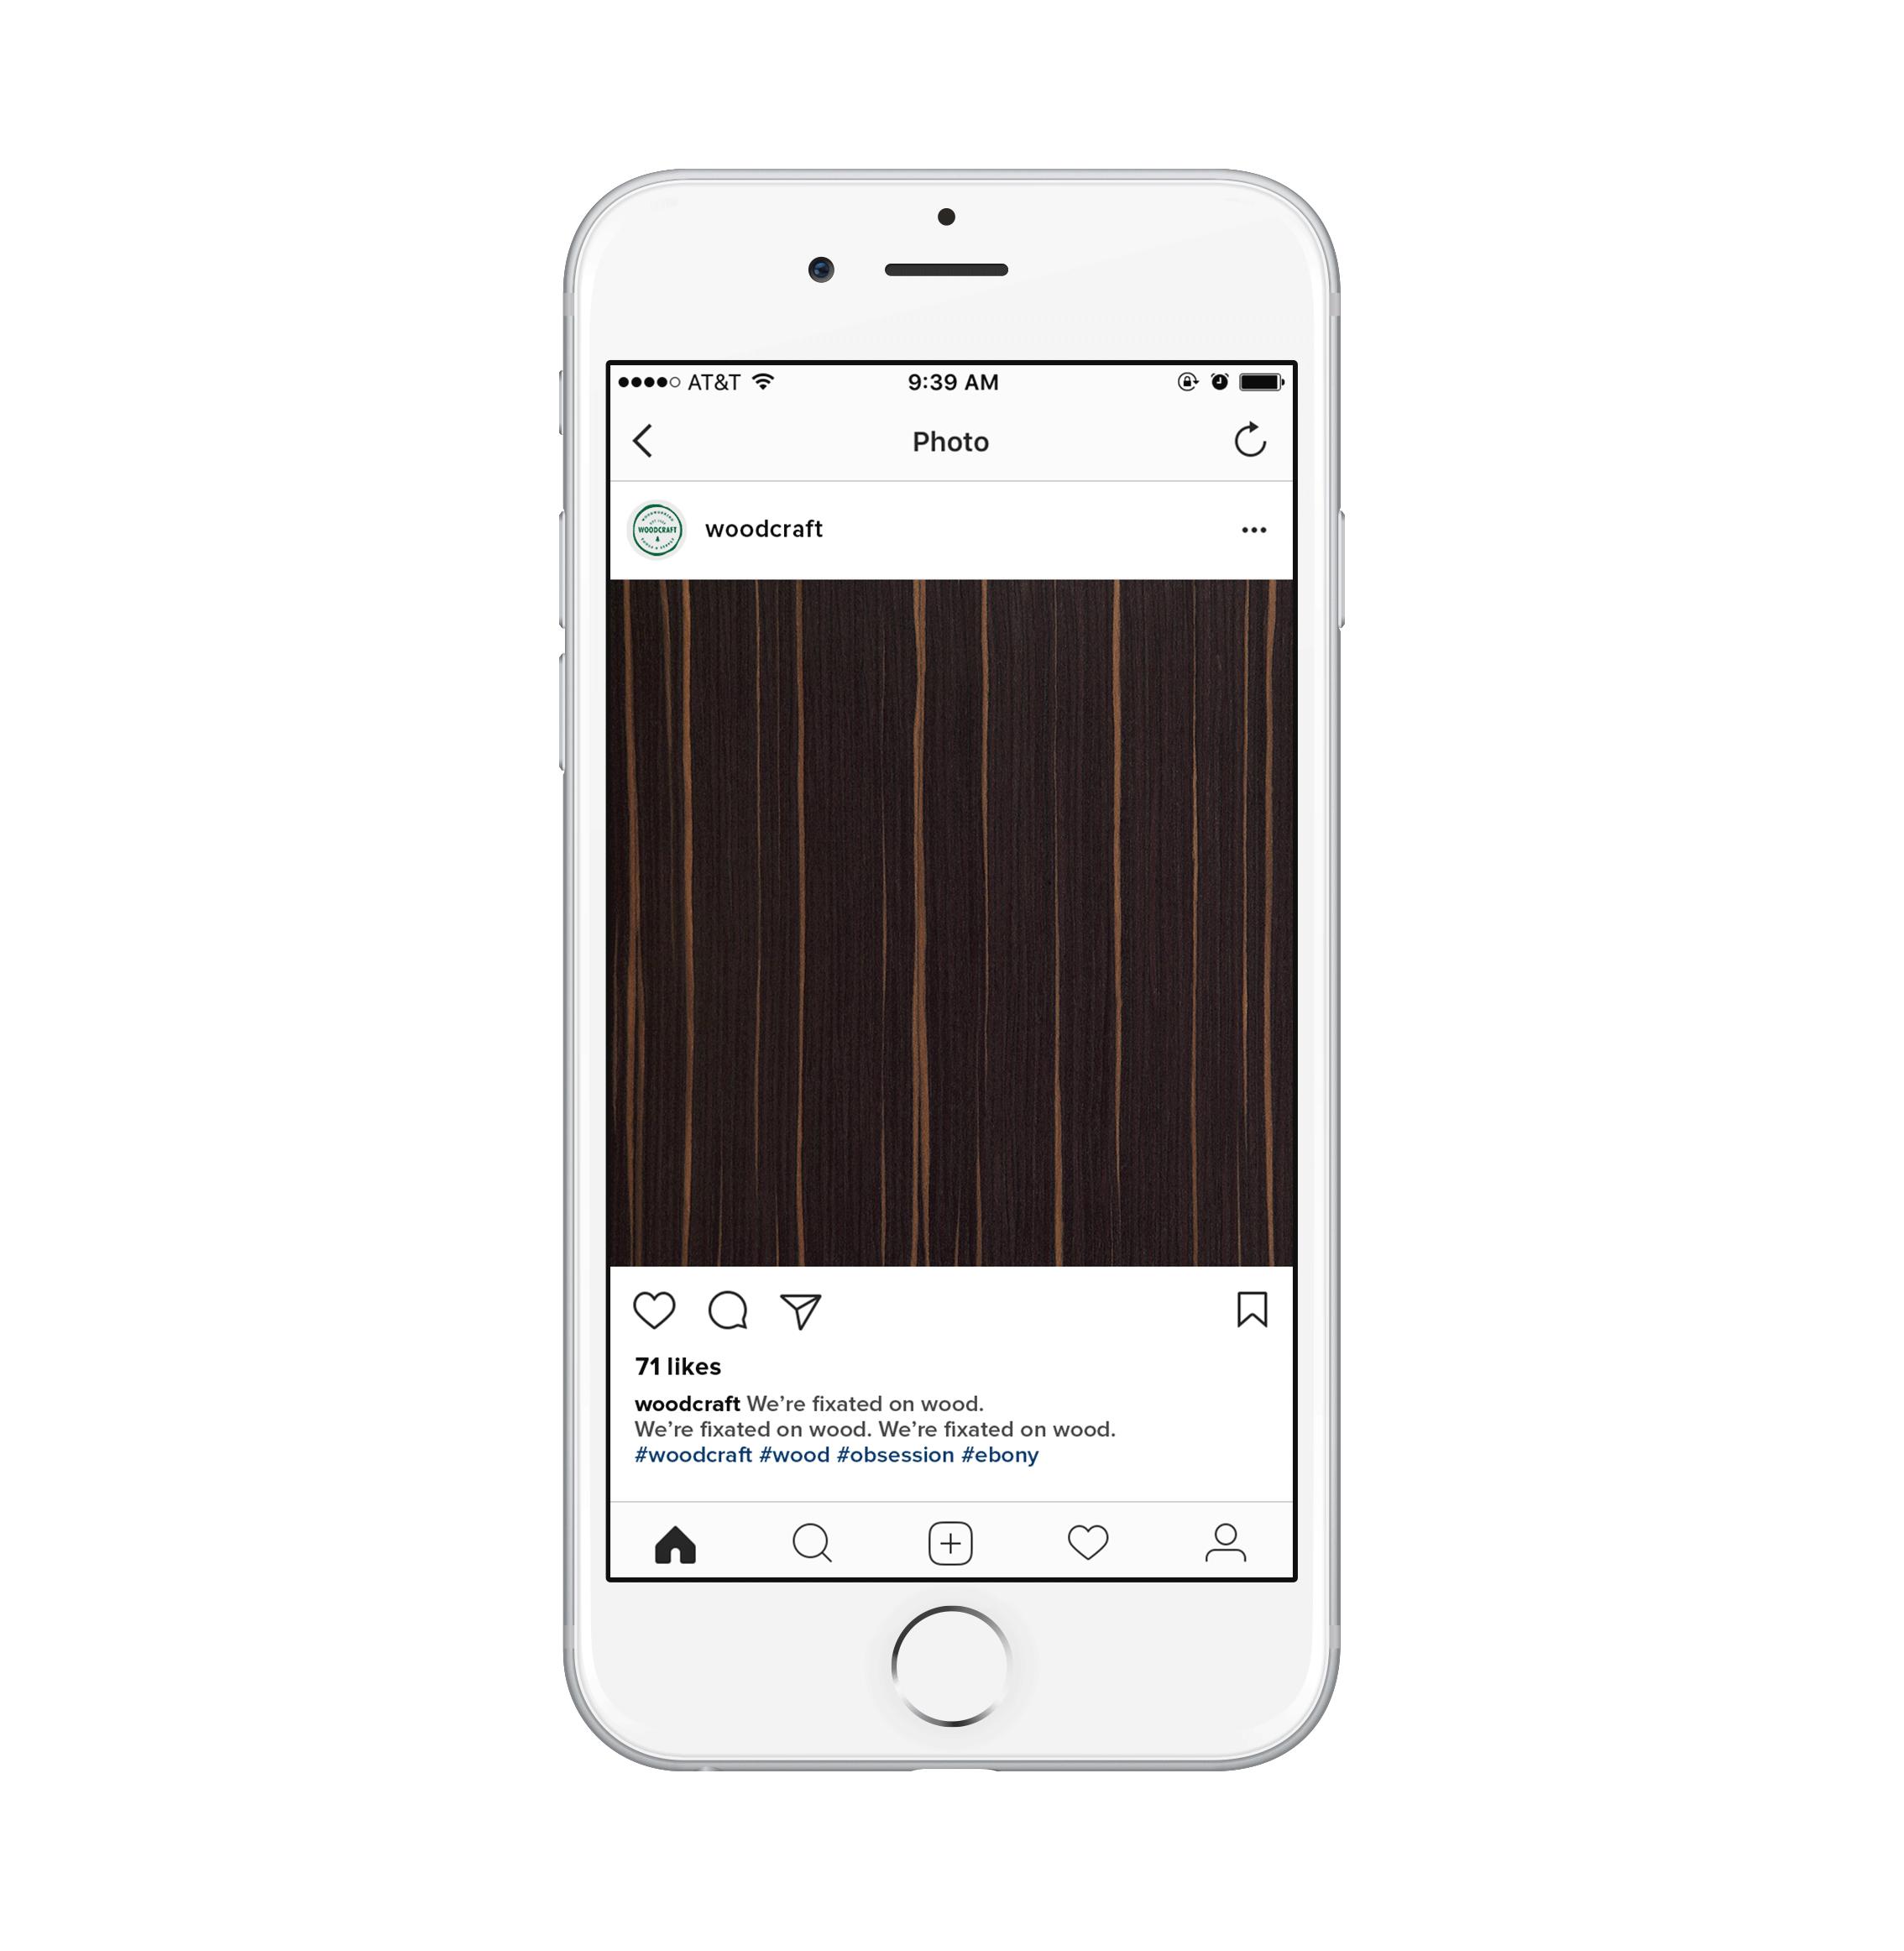 Woodcraft_Social_InstagramFeed_PostEbony.png